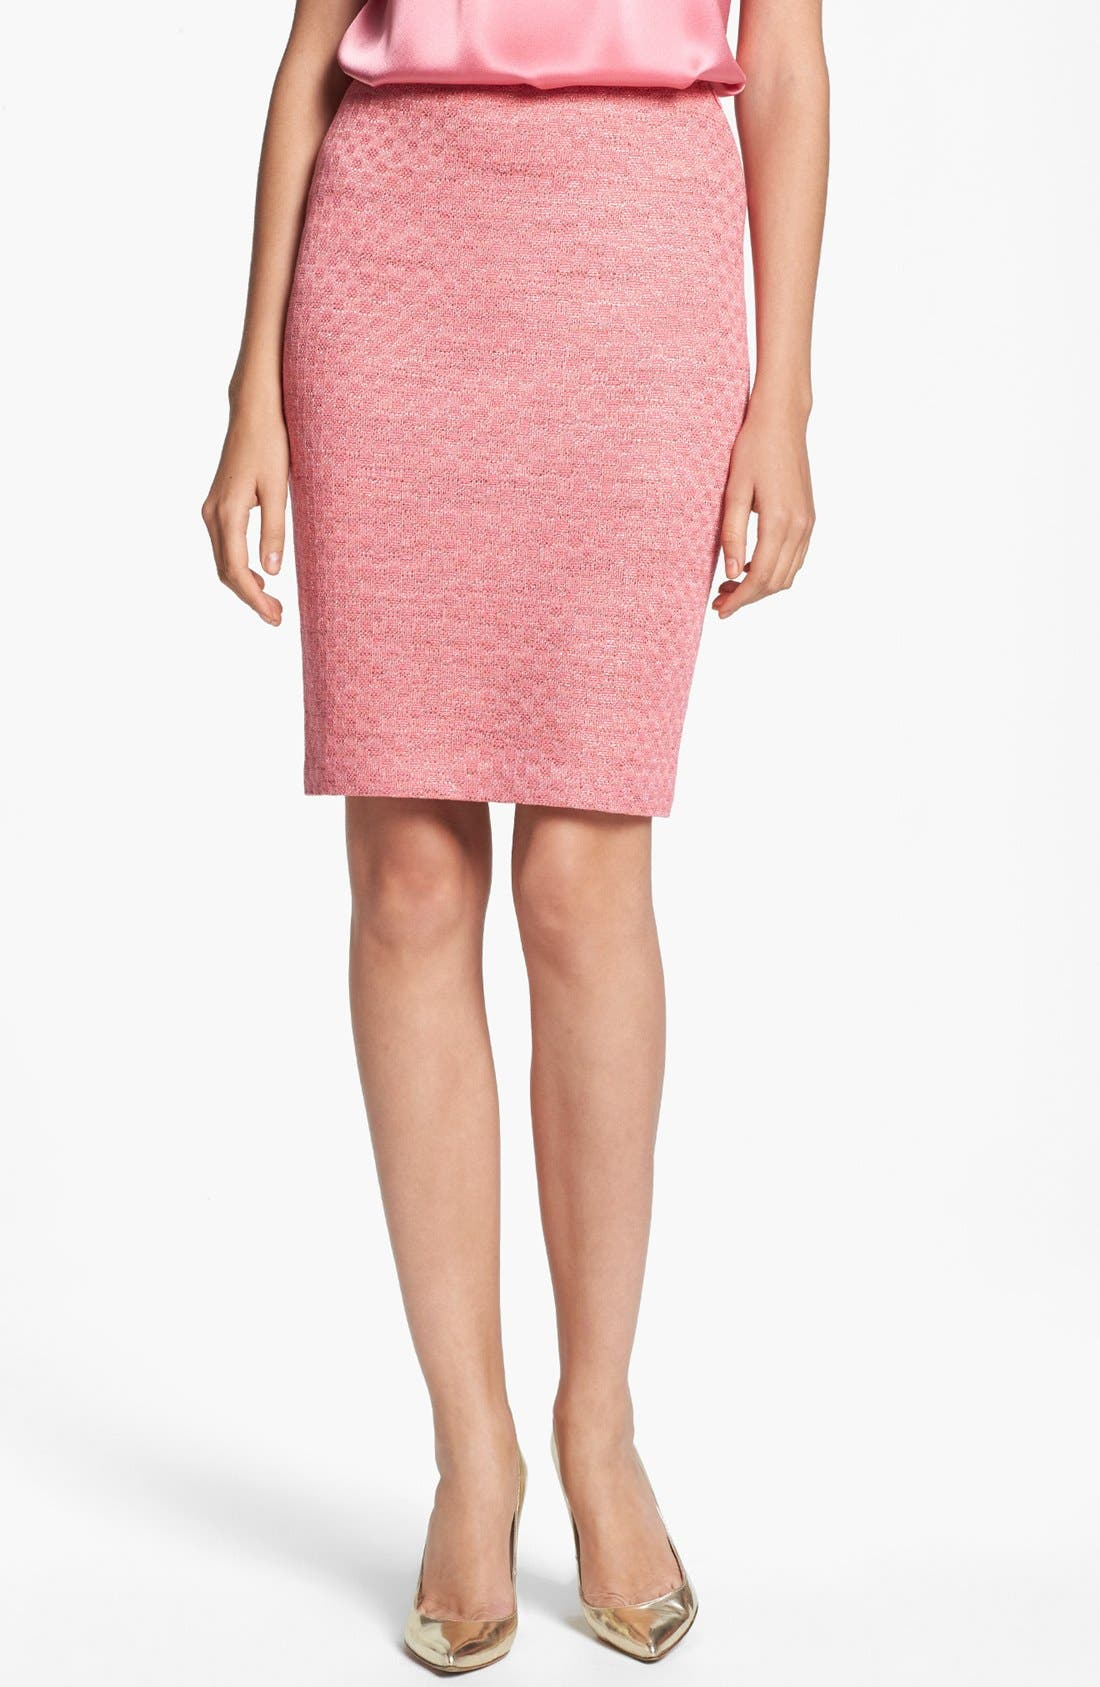 Alternate Image 1 Selected - St. John Collection Damier Knit Pencil Skirt